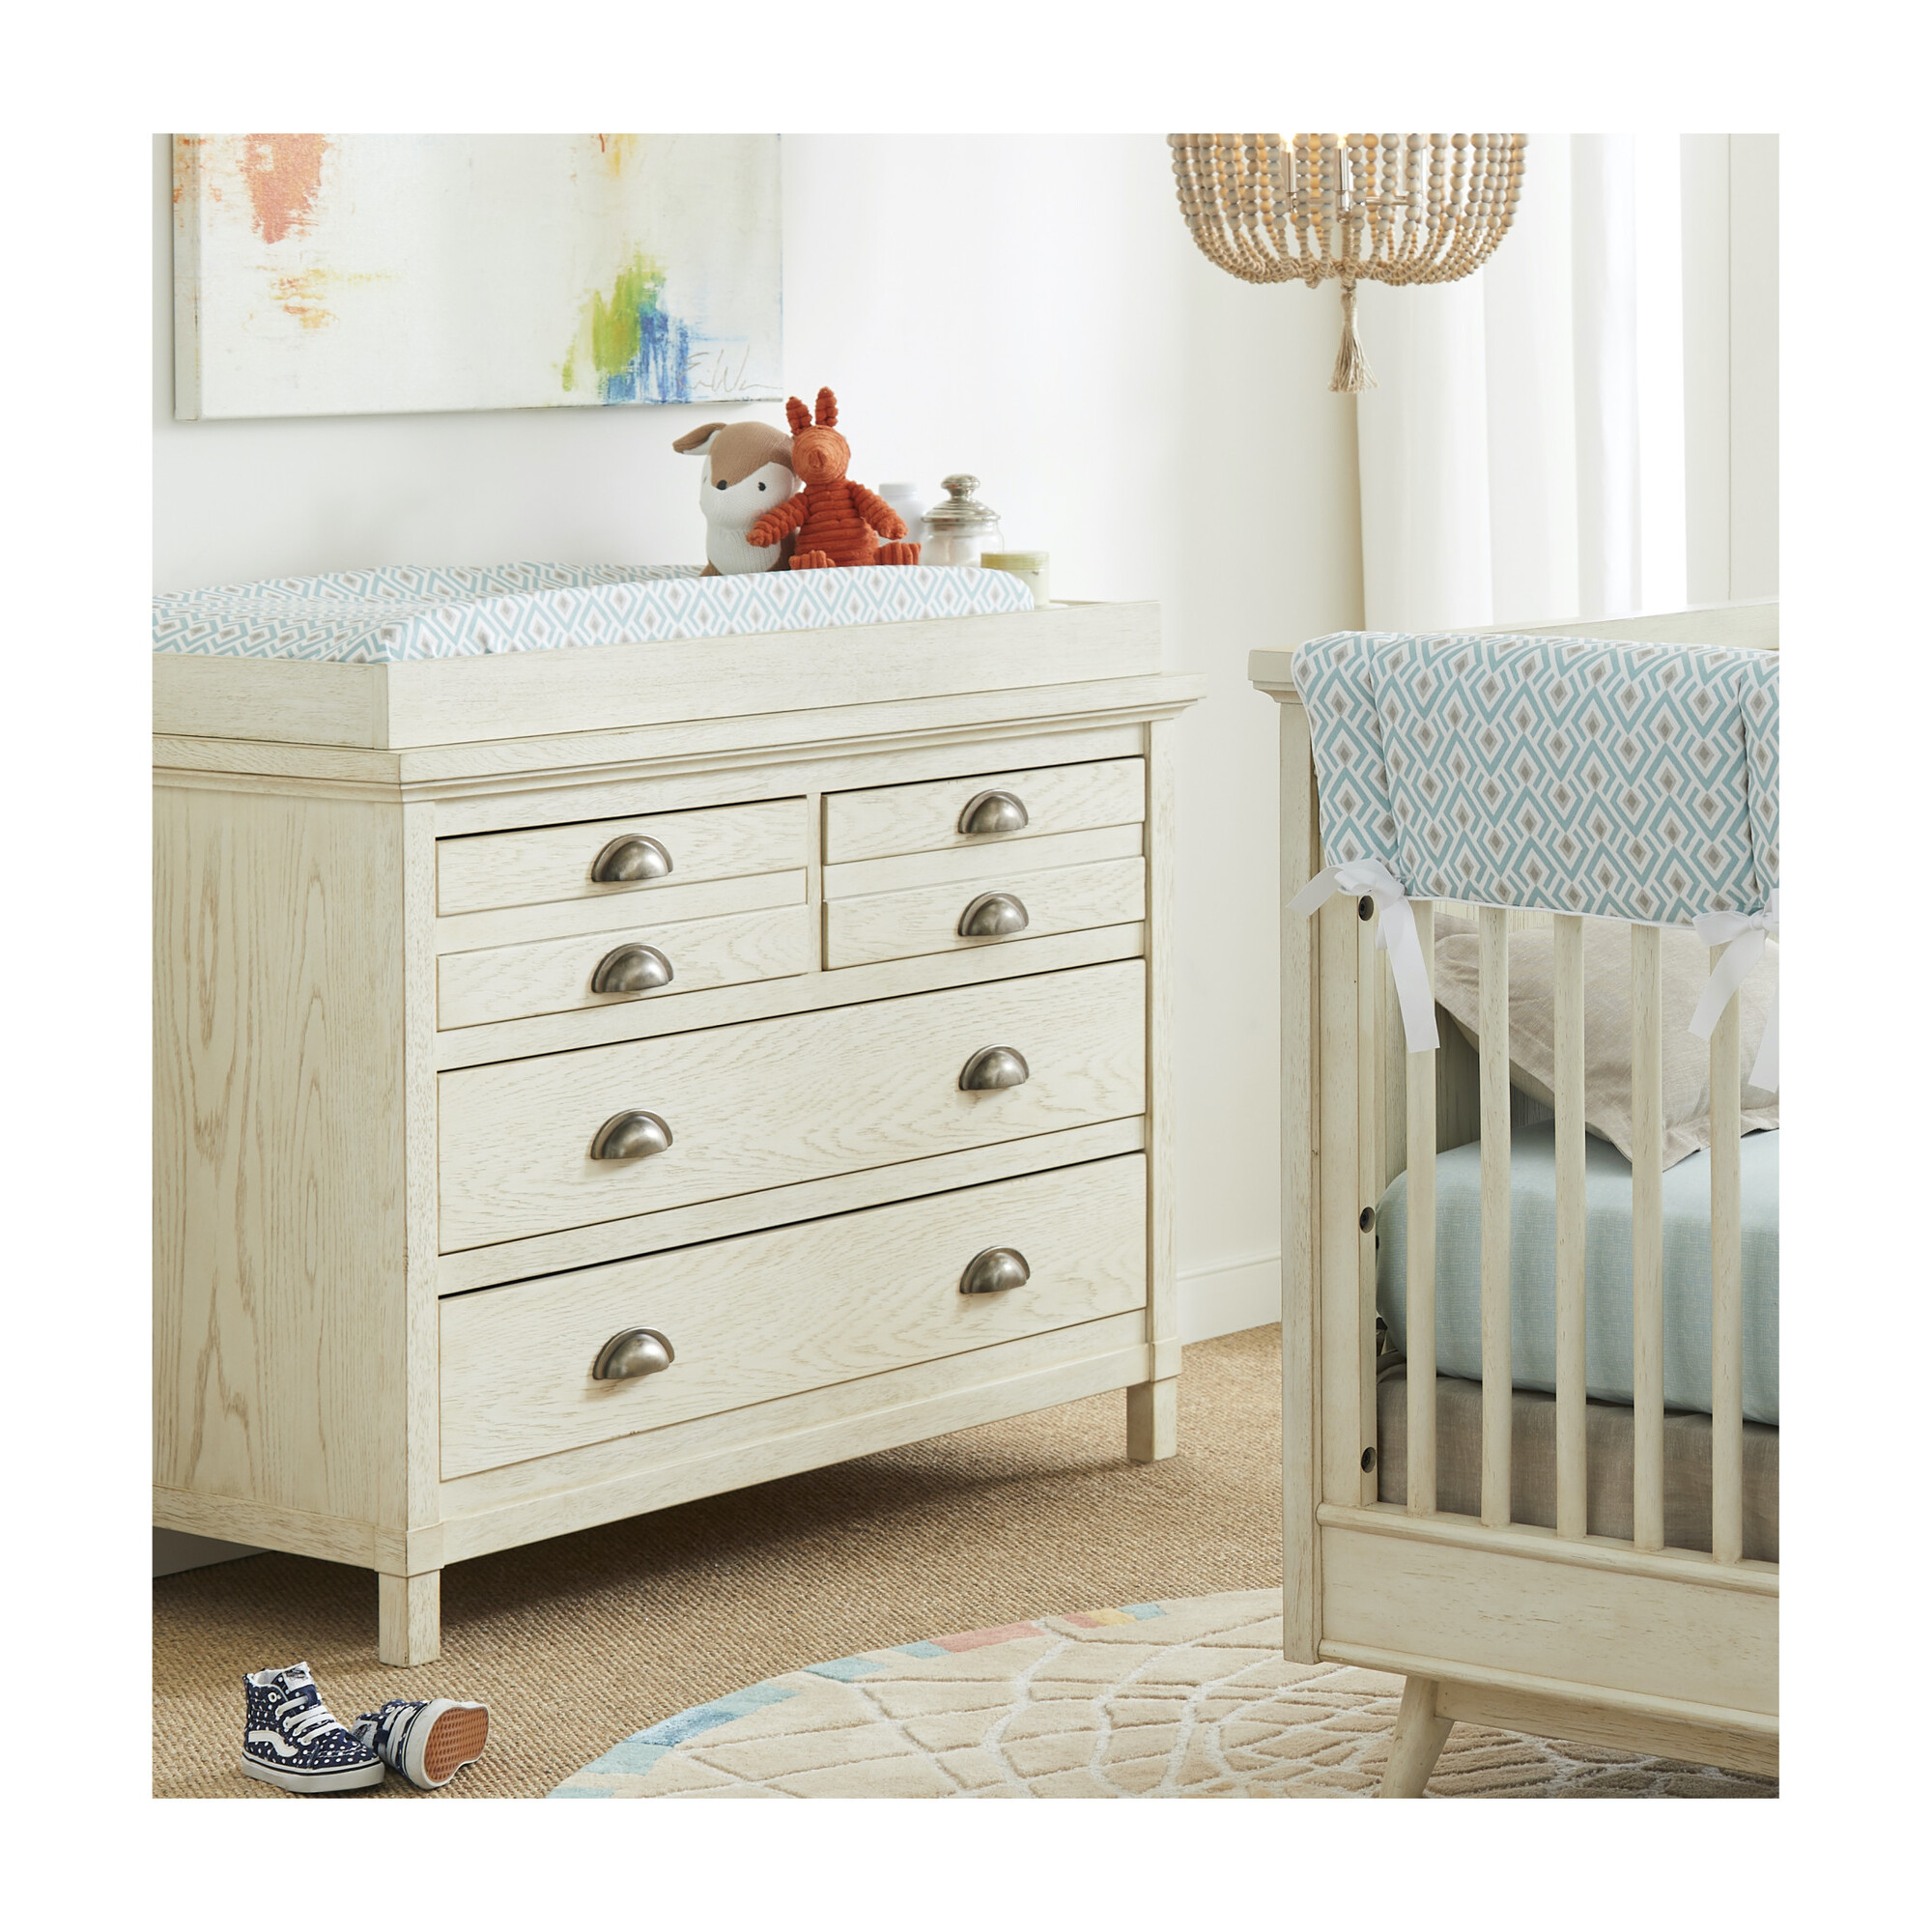 Driftwood Park Changing Station Vanilla Oak Home Furniture Dressers Changing Tables Maisonette